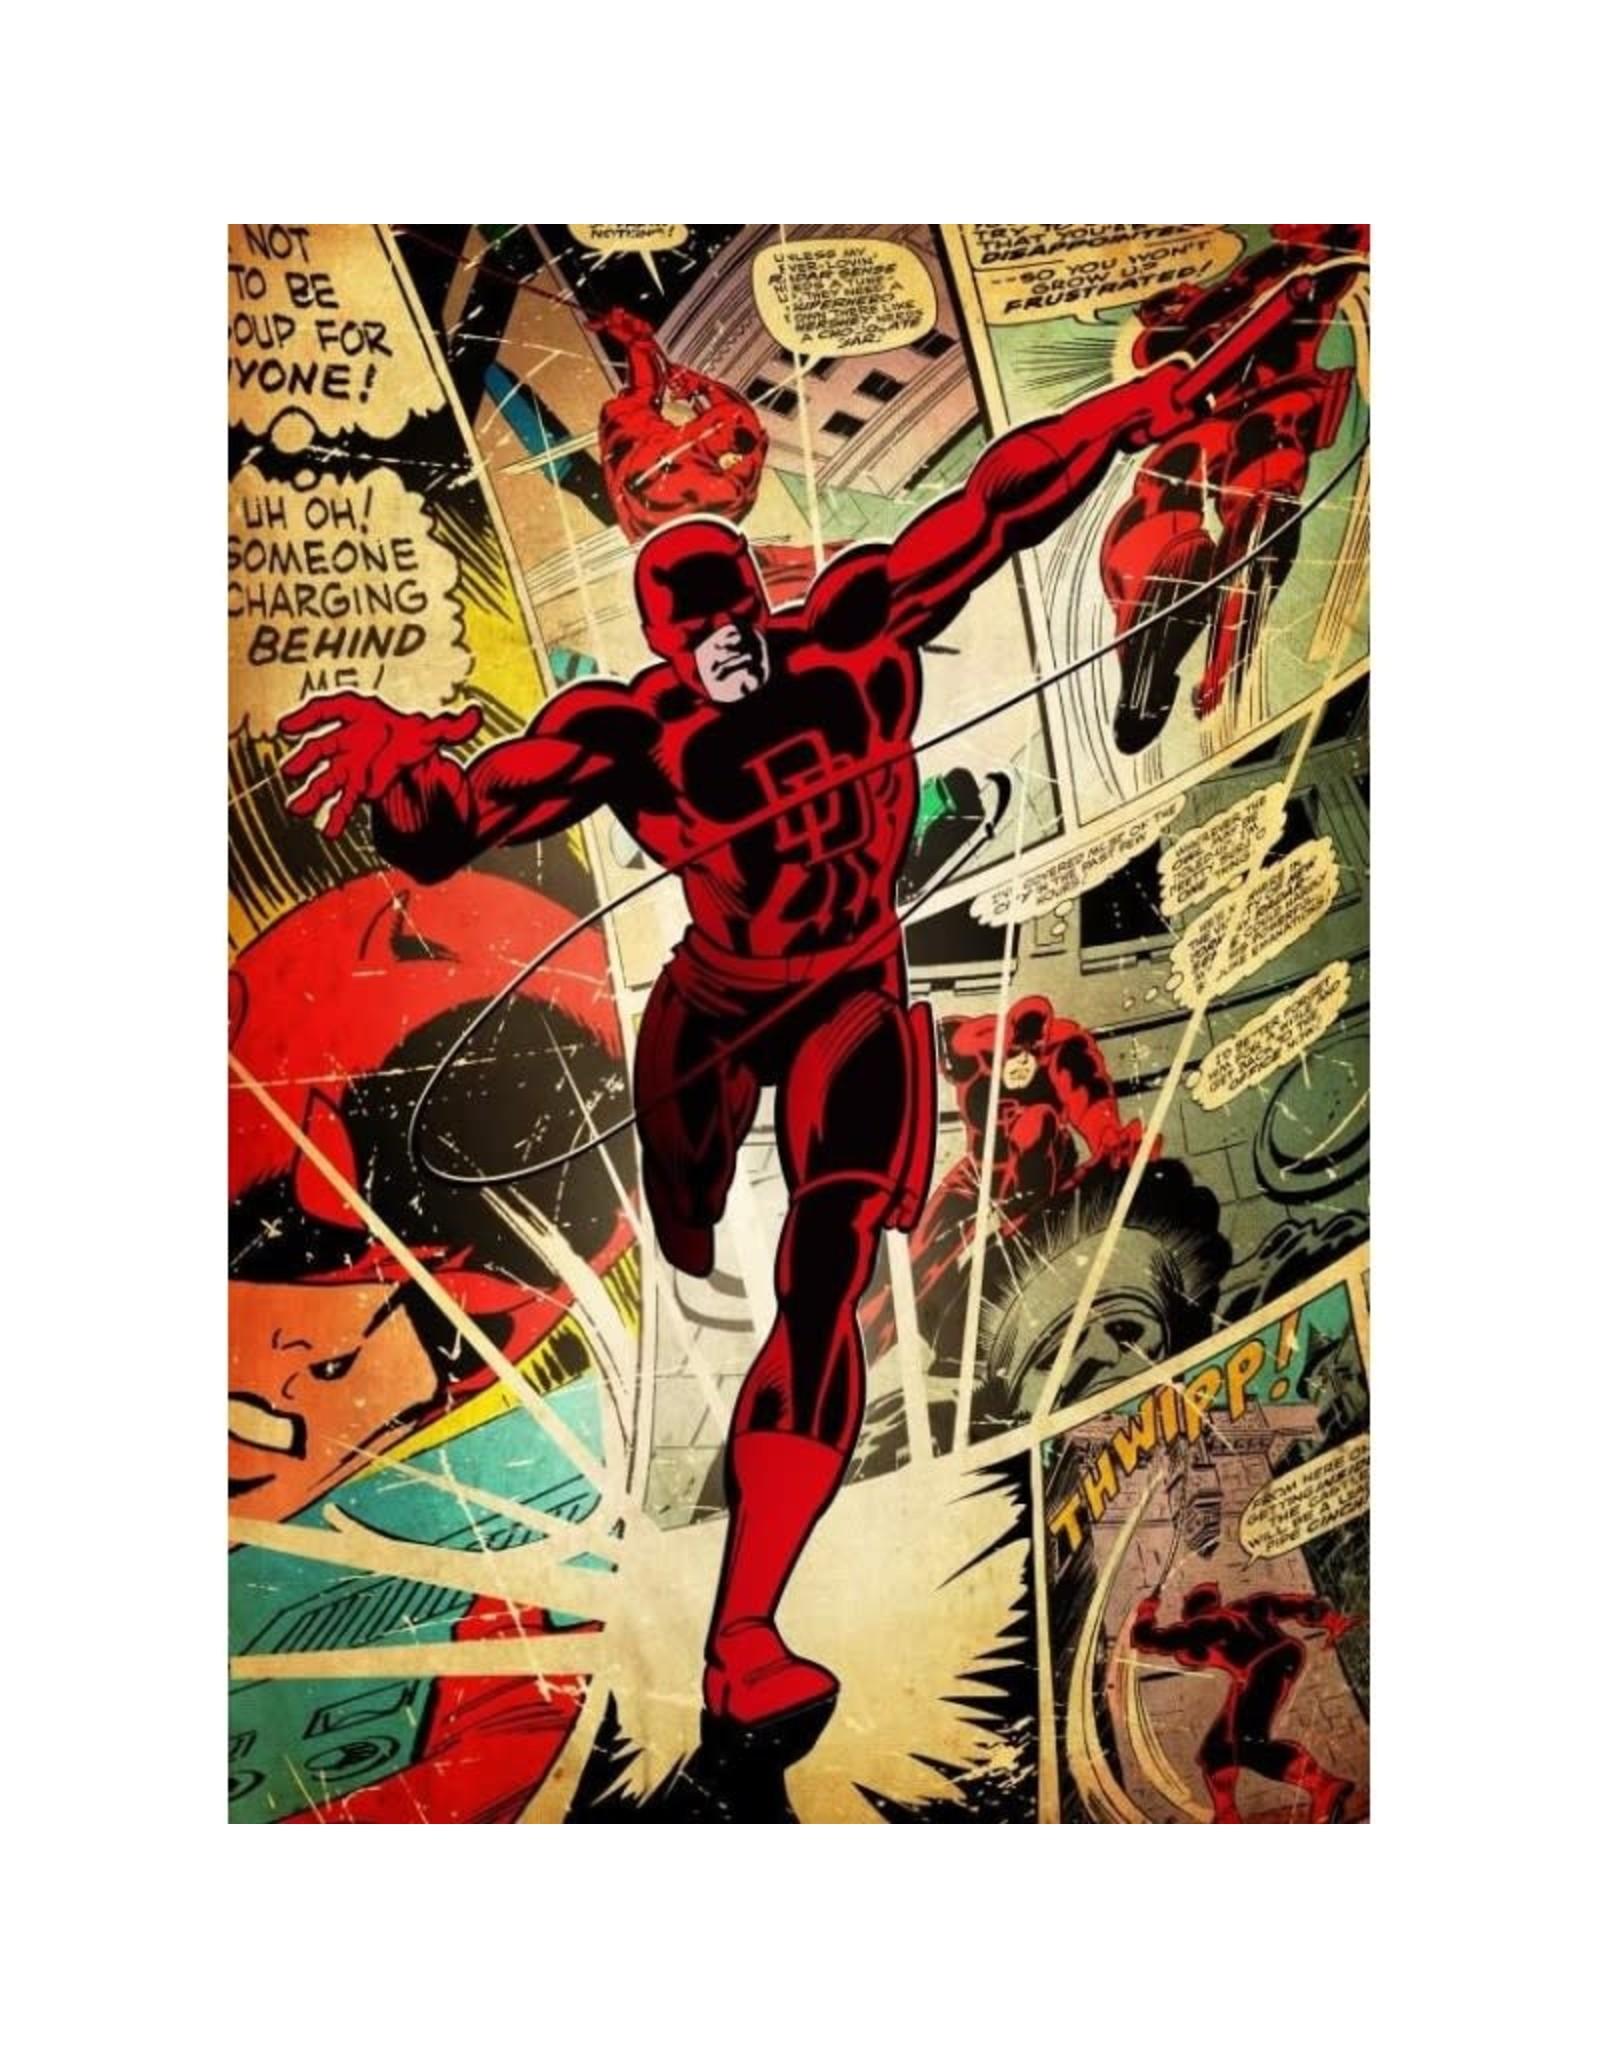 MARVEL SILVER AGE - Magnetic Metal Poster 45x32 - Daredevil